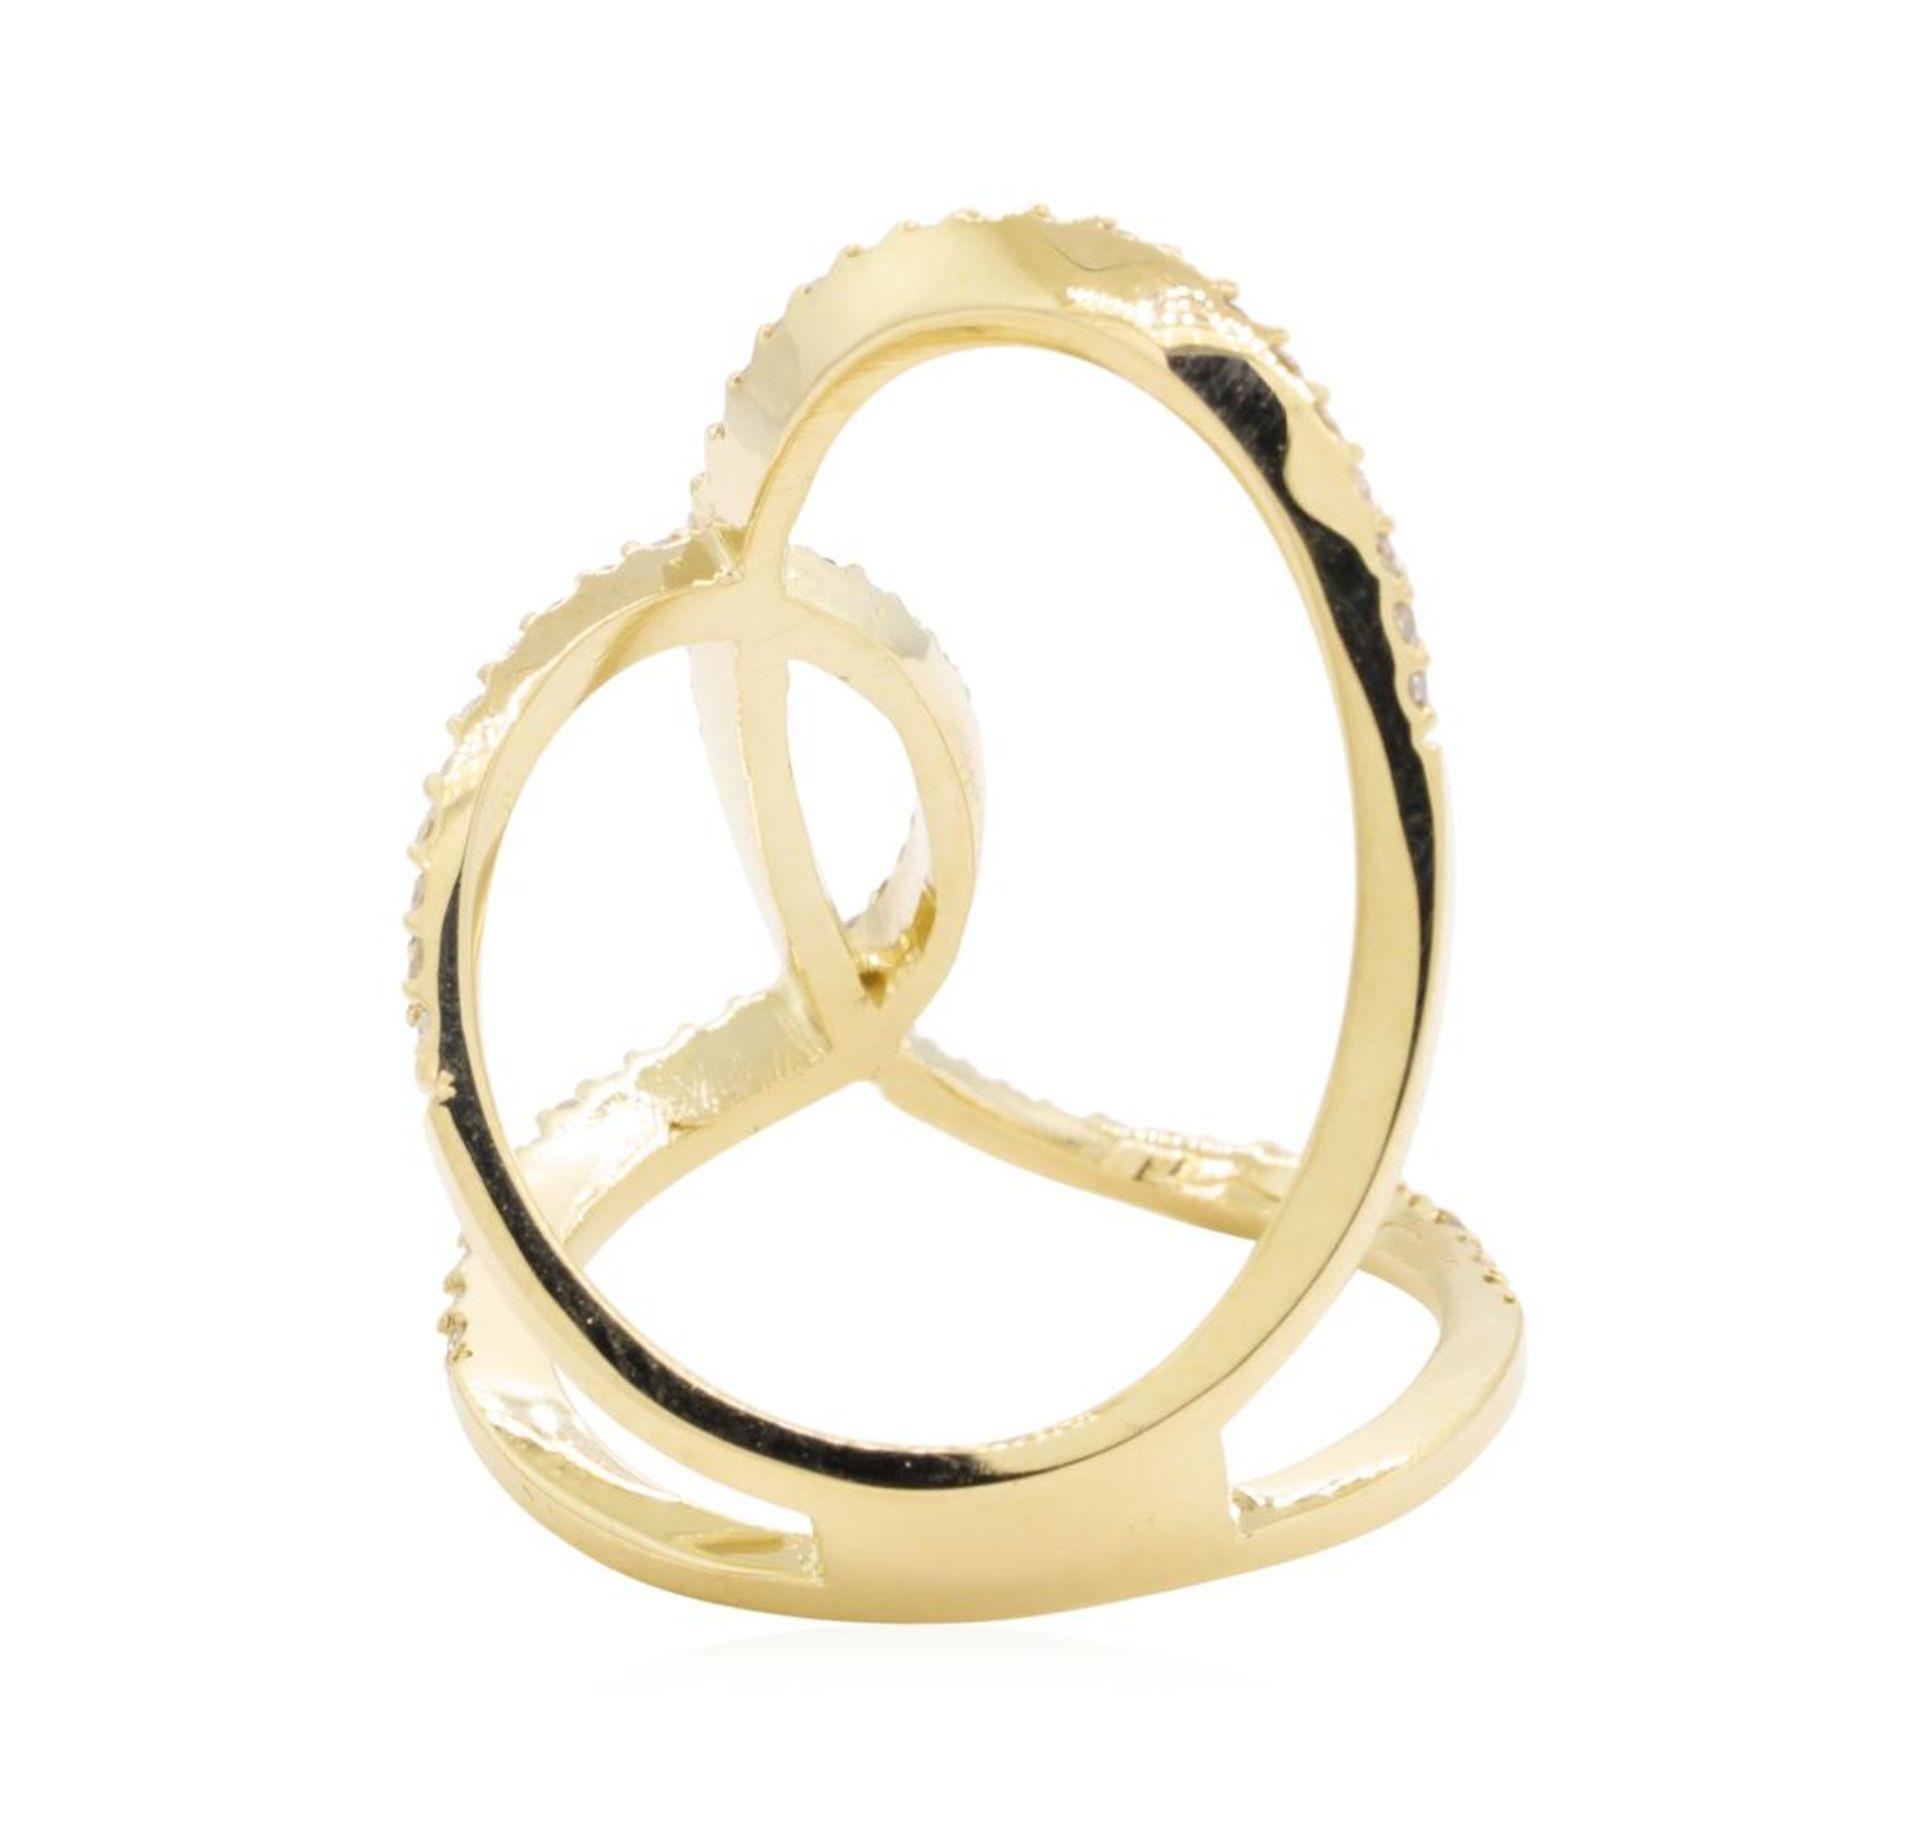 0.75 ctw Diamond Ring - 14KT Yellow Gold - Image 3 of 5